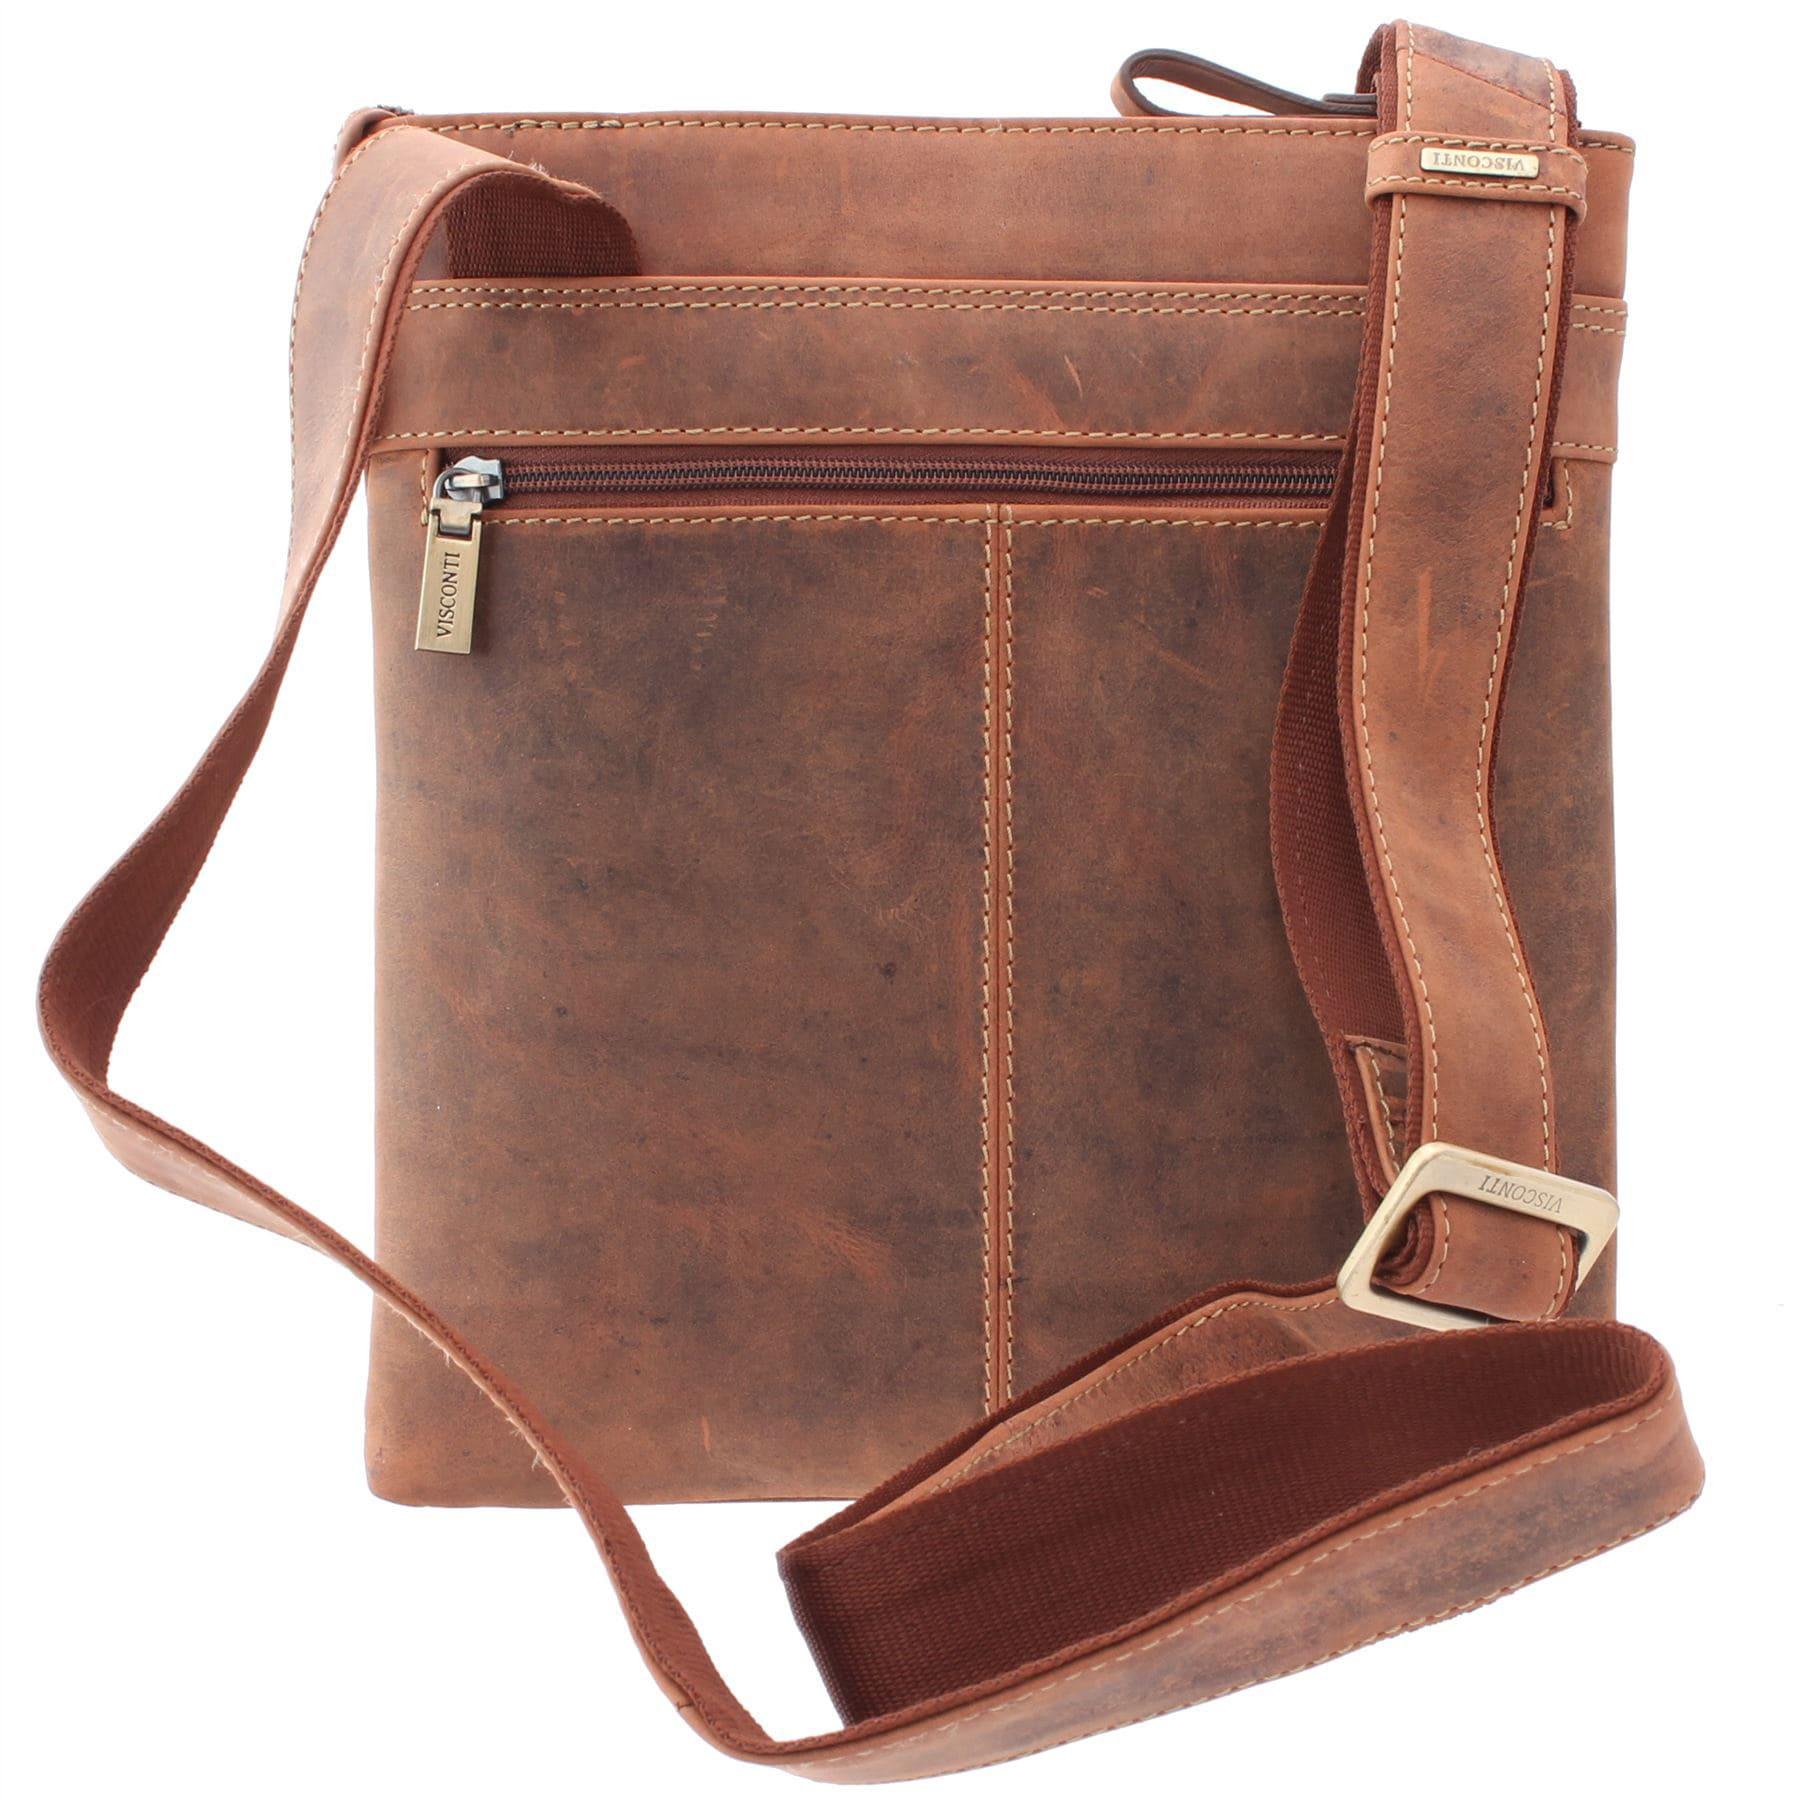 Visconti Taylor Messenger Shoulder Crossbody Bag Handbag ...